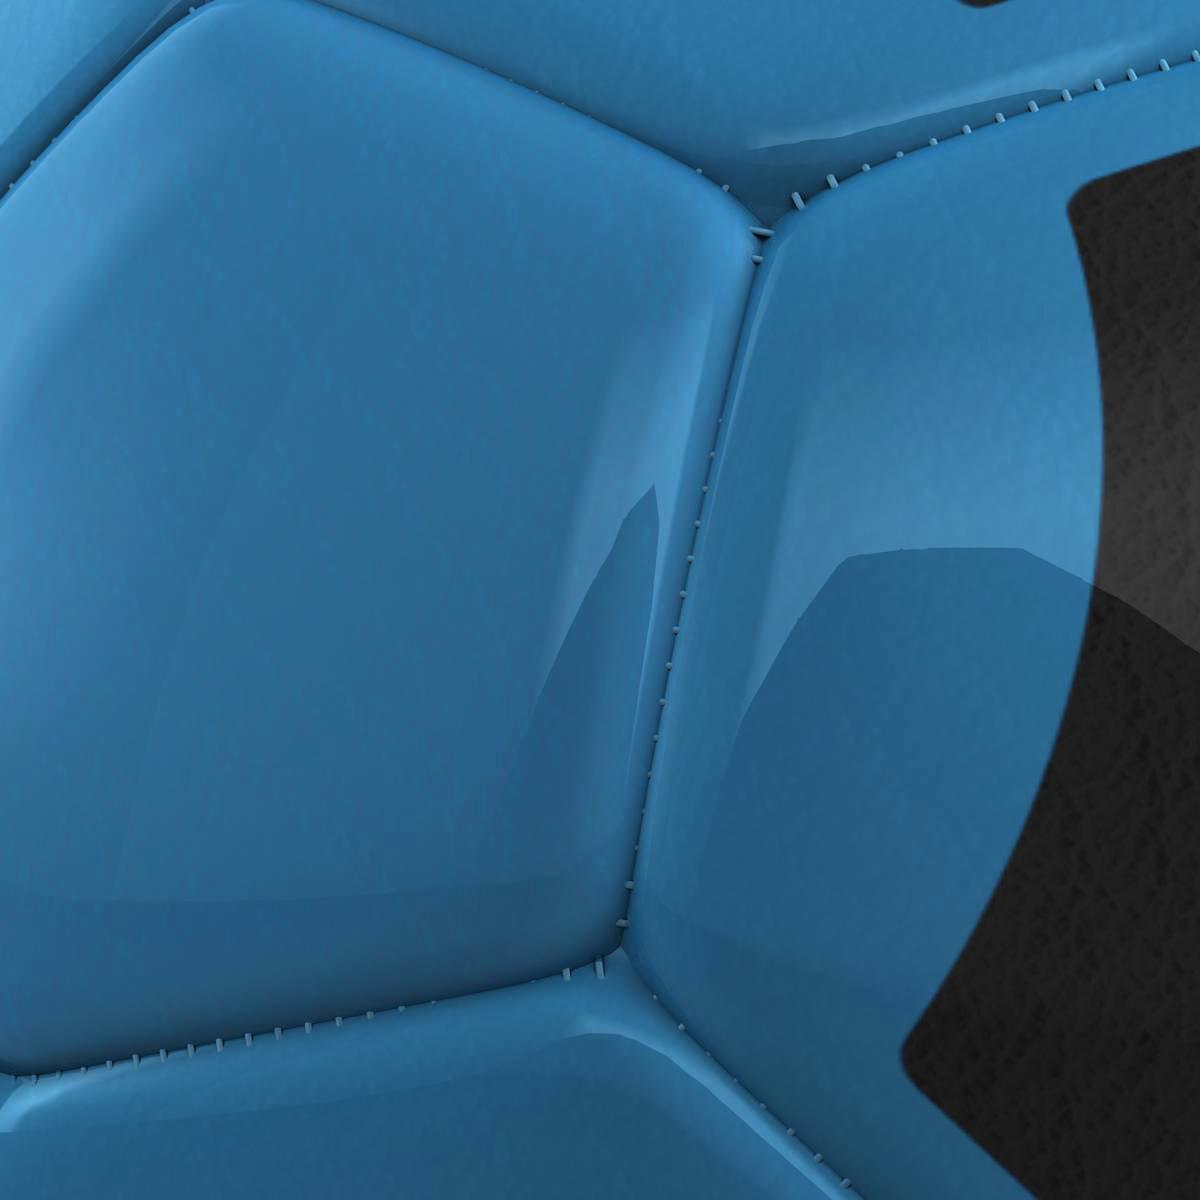 soccerball цэнхэр хар 3d загвар 3ds max fbx c4d ma mb obj 204380